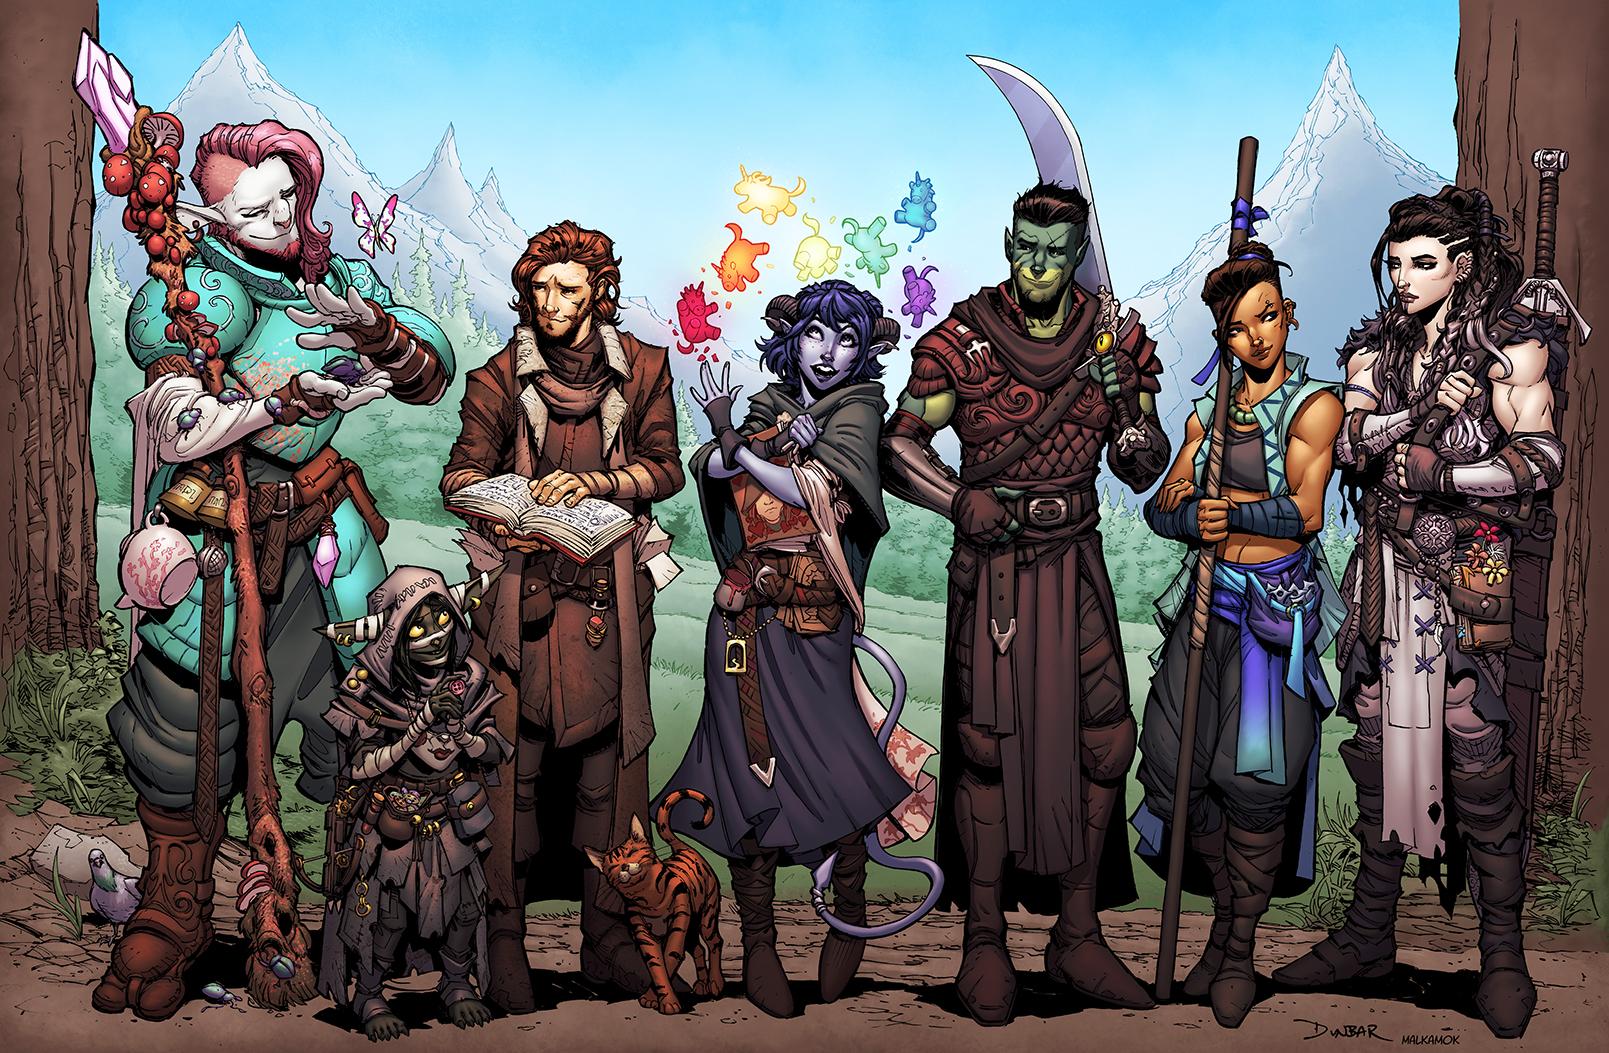 Mighty Nein - COLORS by Malkamok on DeviantArt